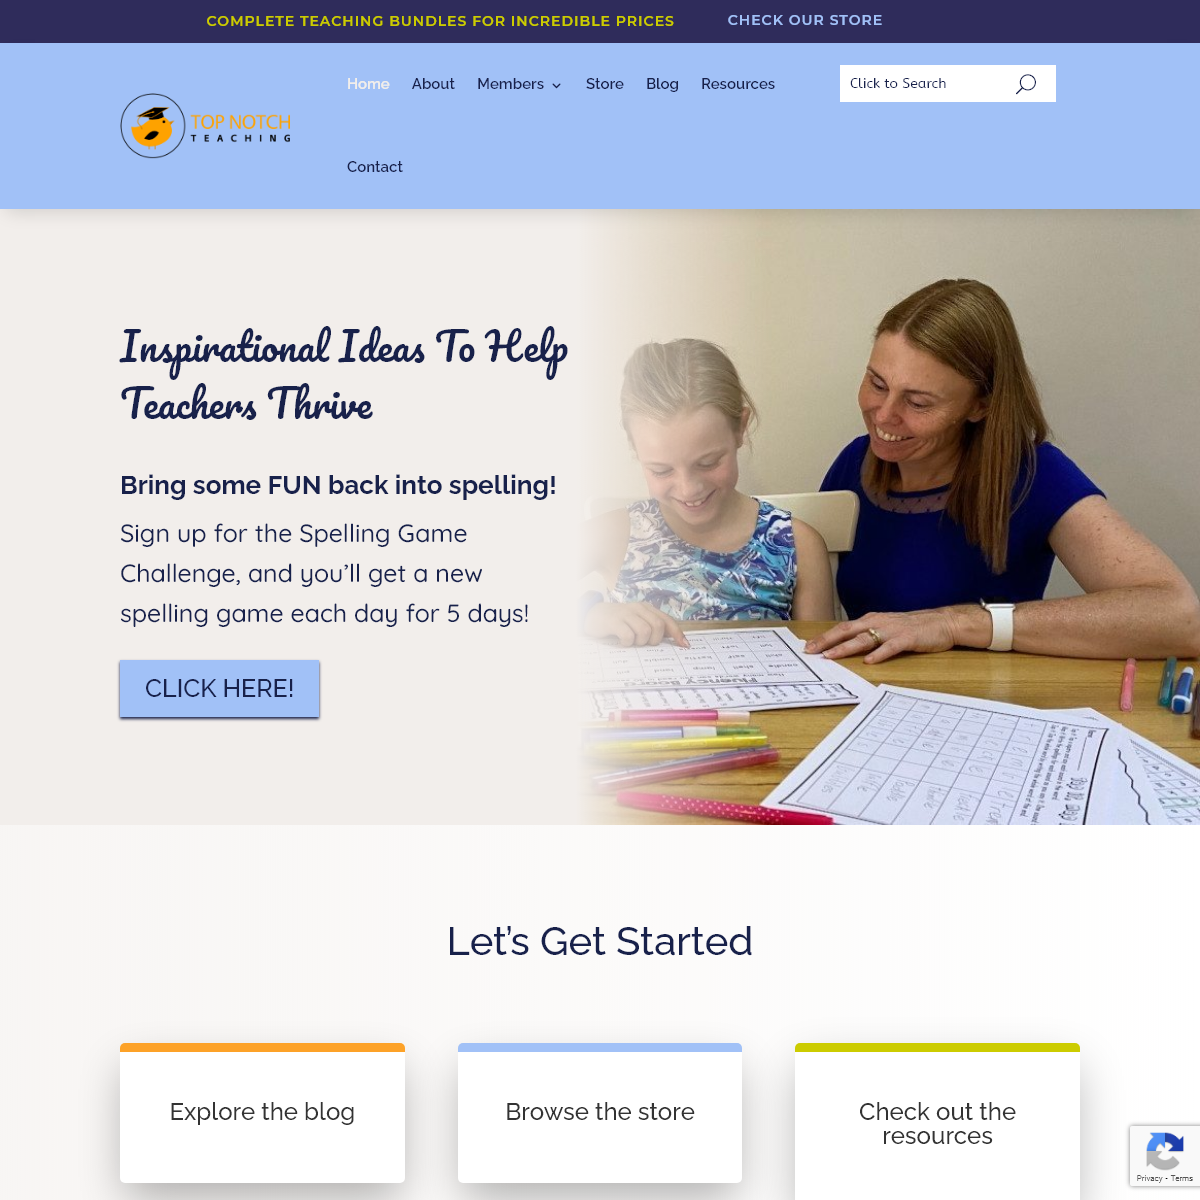 Home - Top Notch Teaching